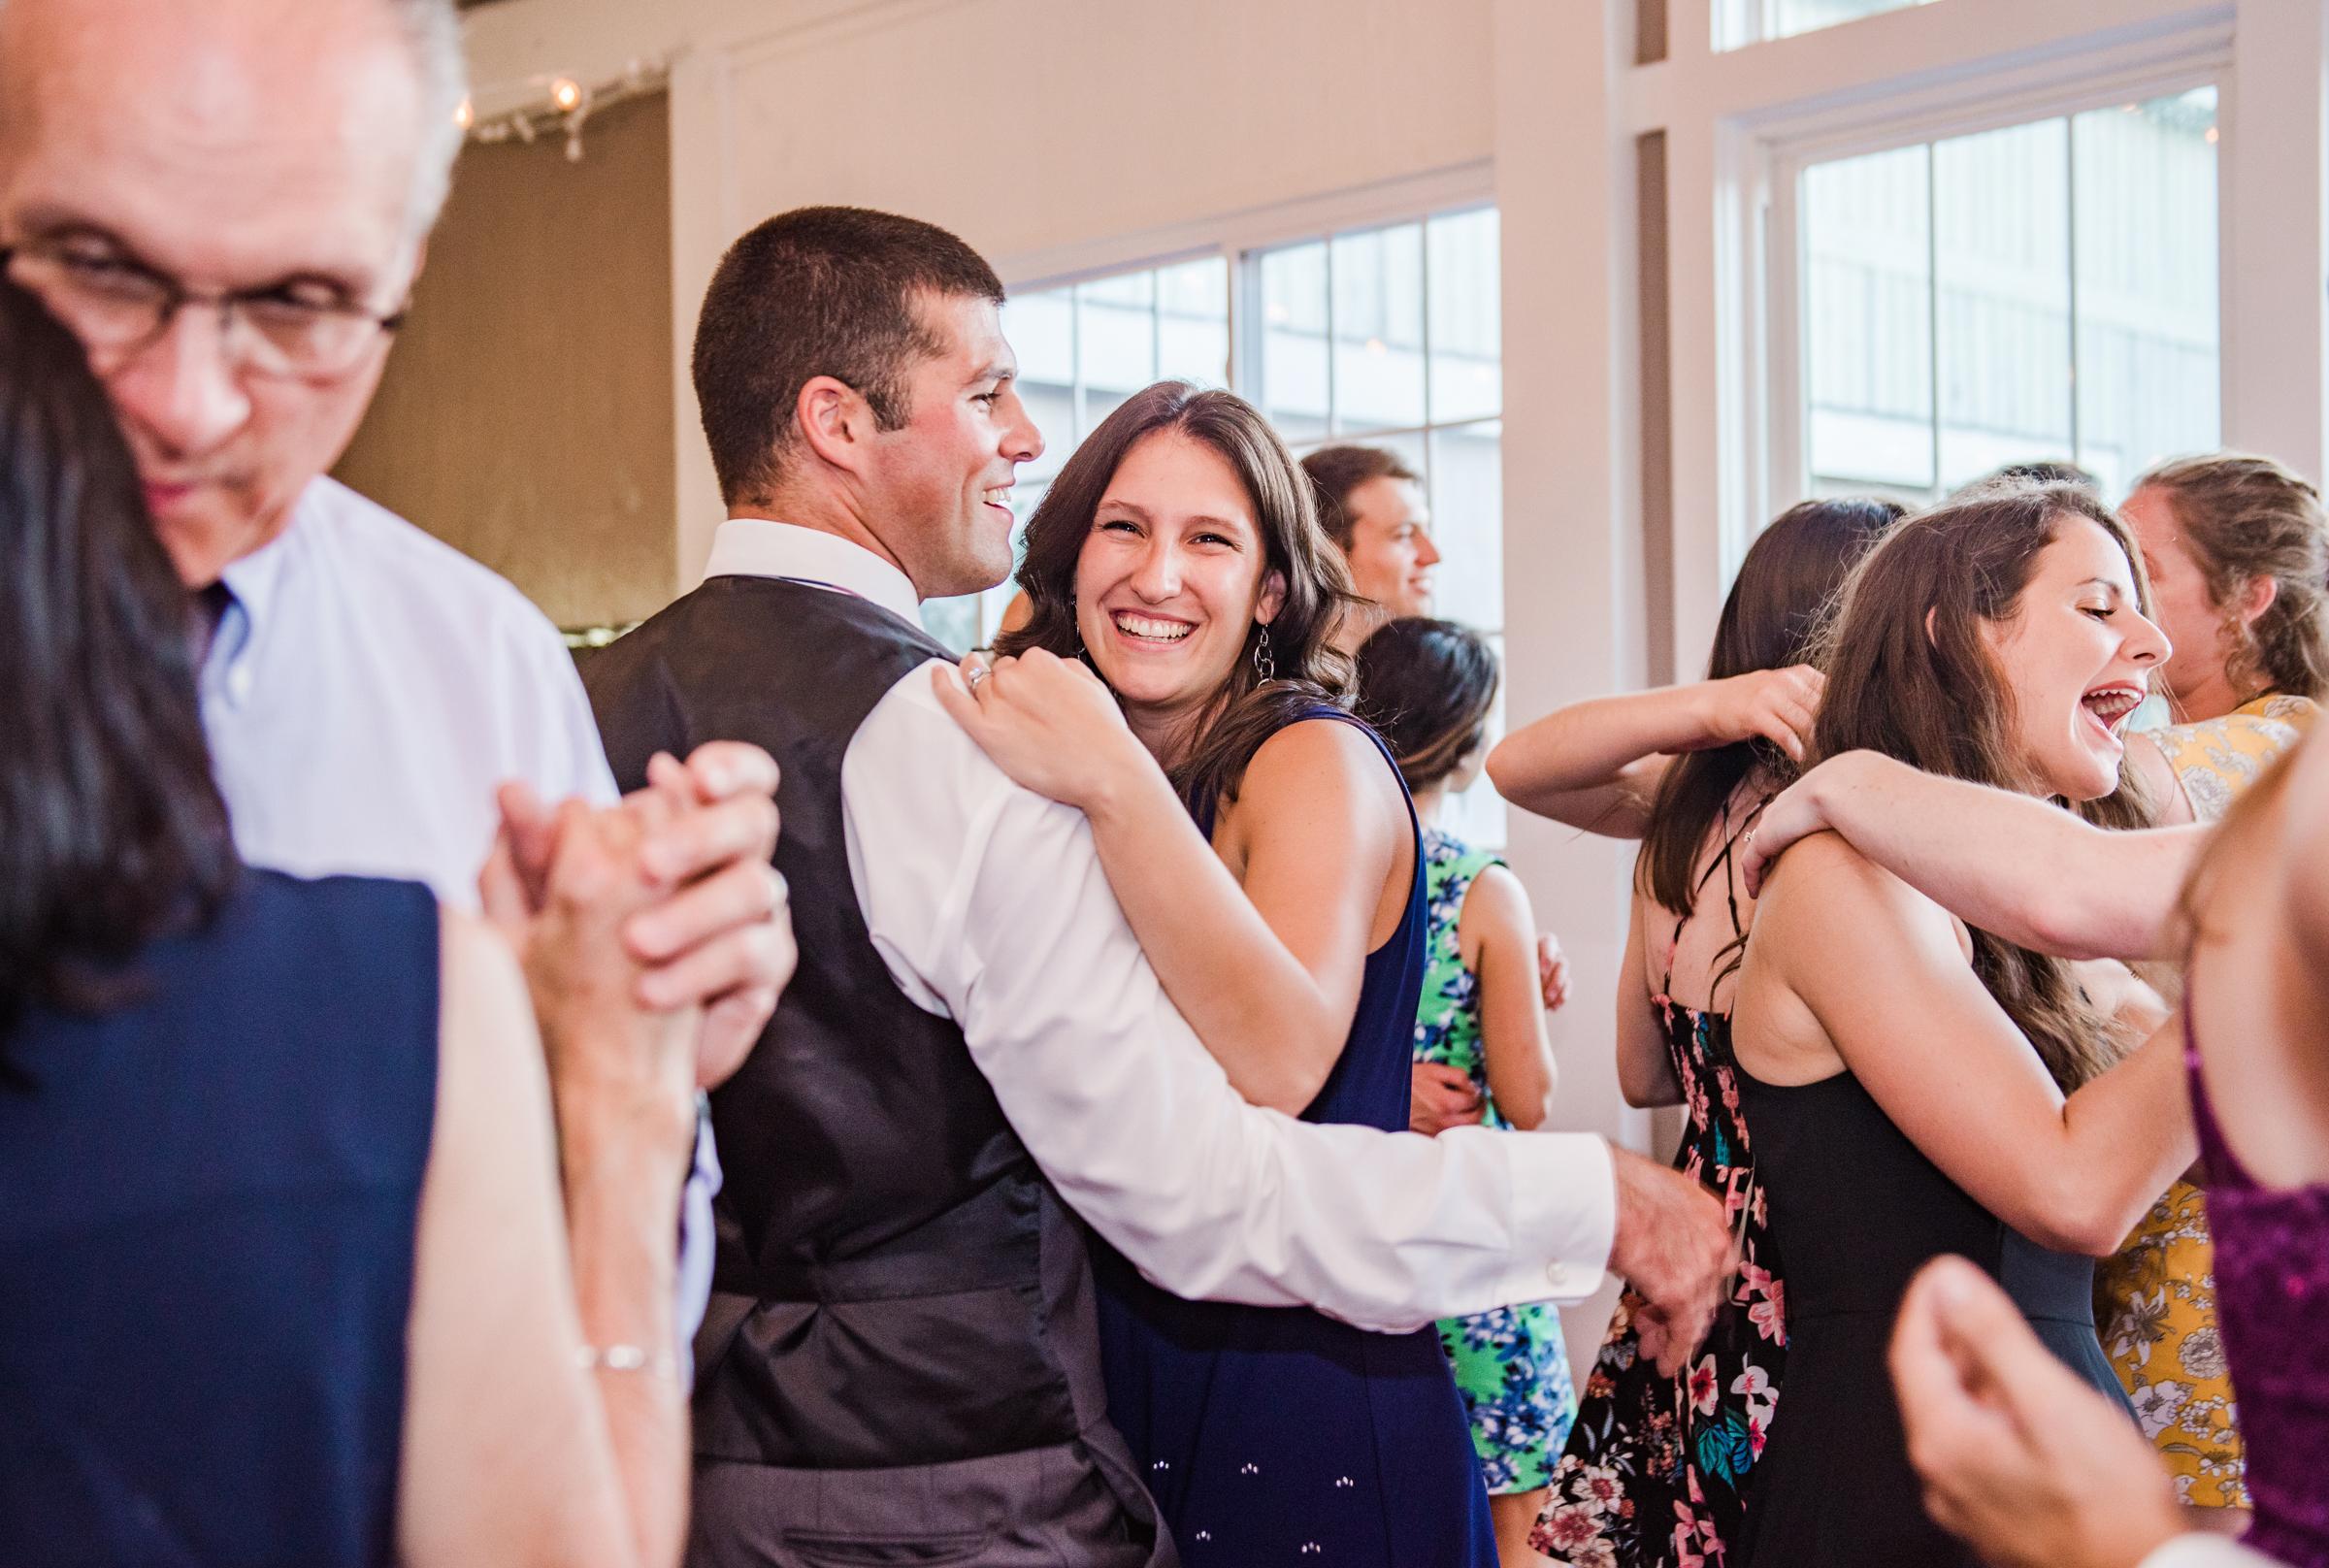 Jerris_Wadsworth_Wedding_Barn_Rochester_Wedding_JILL_STUDIO_Rochester_NY_Photographer_DSC_3049.jpg